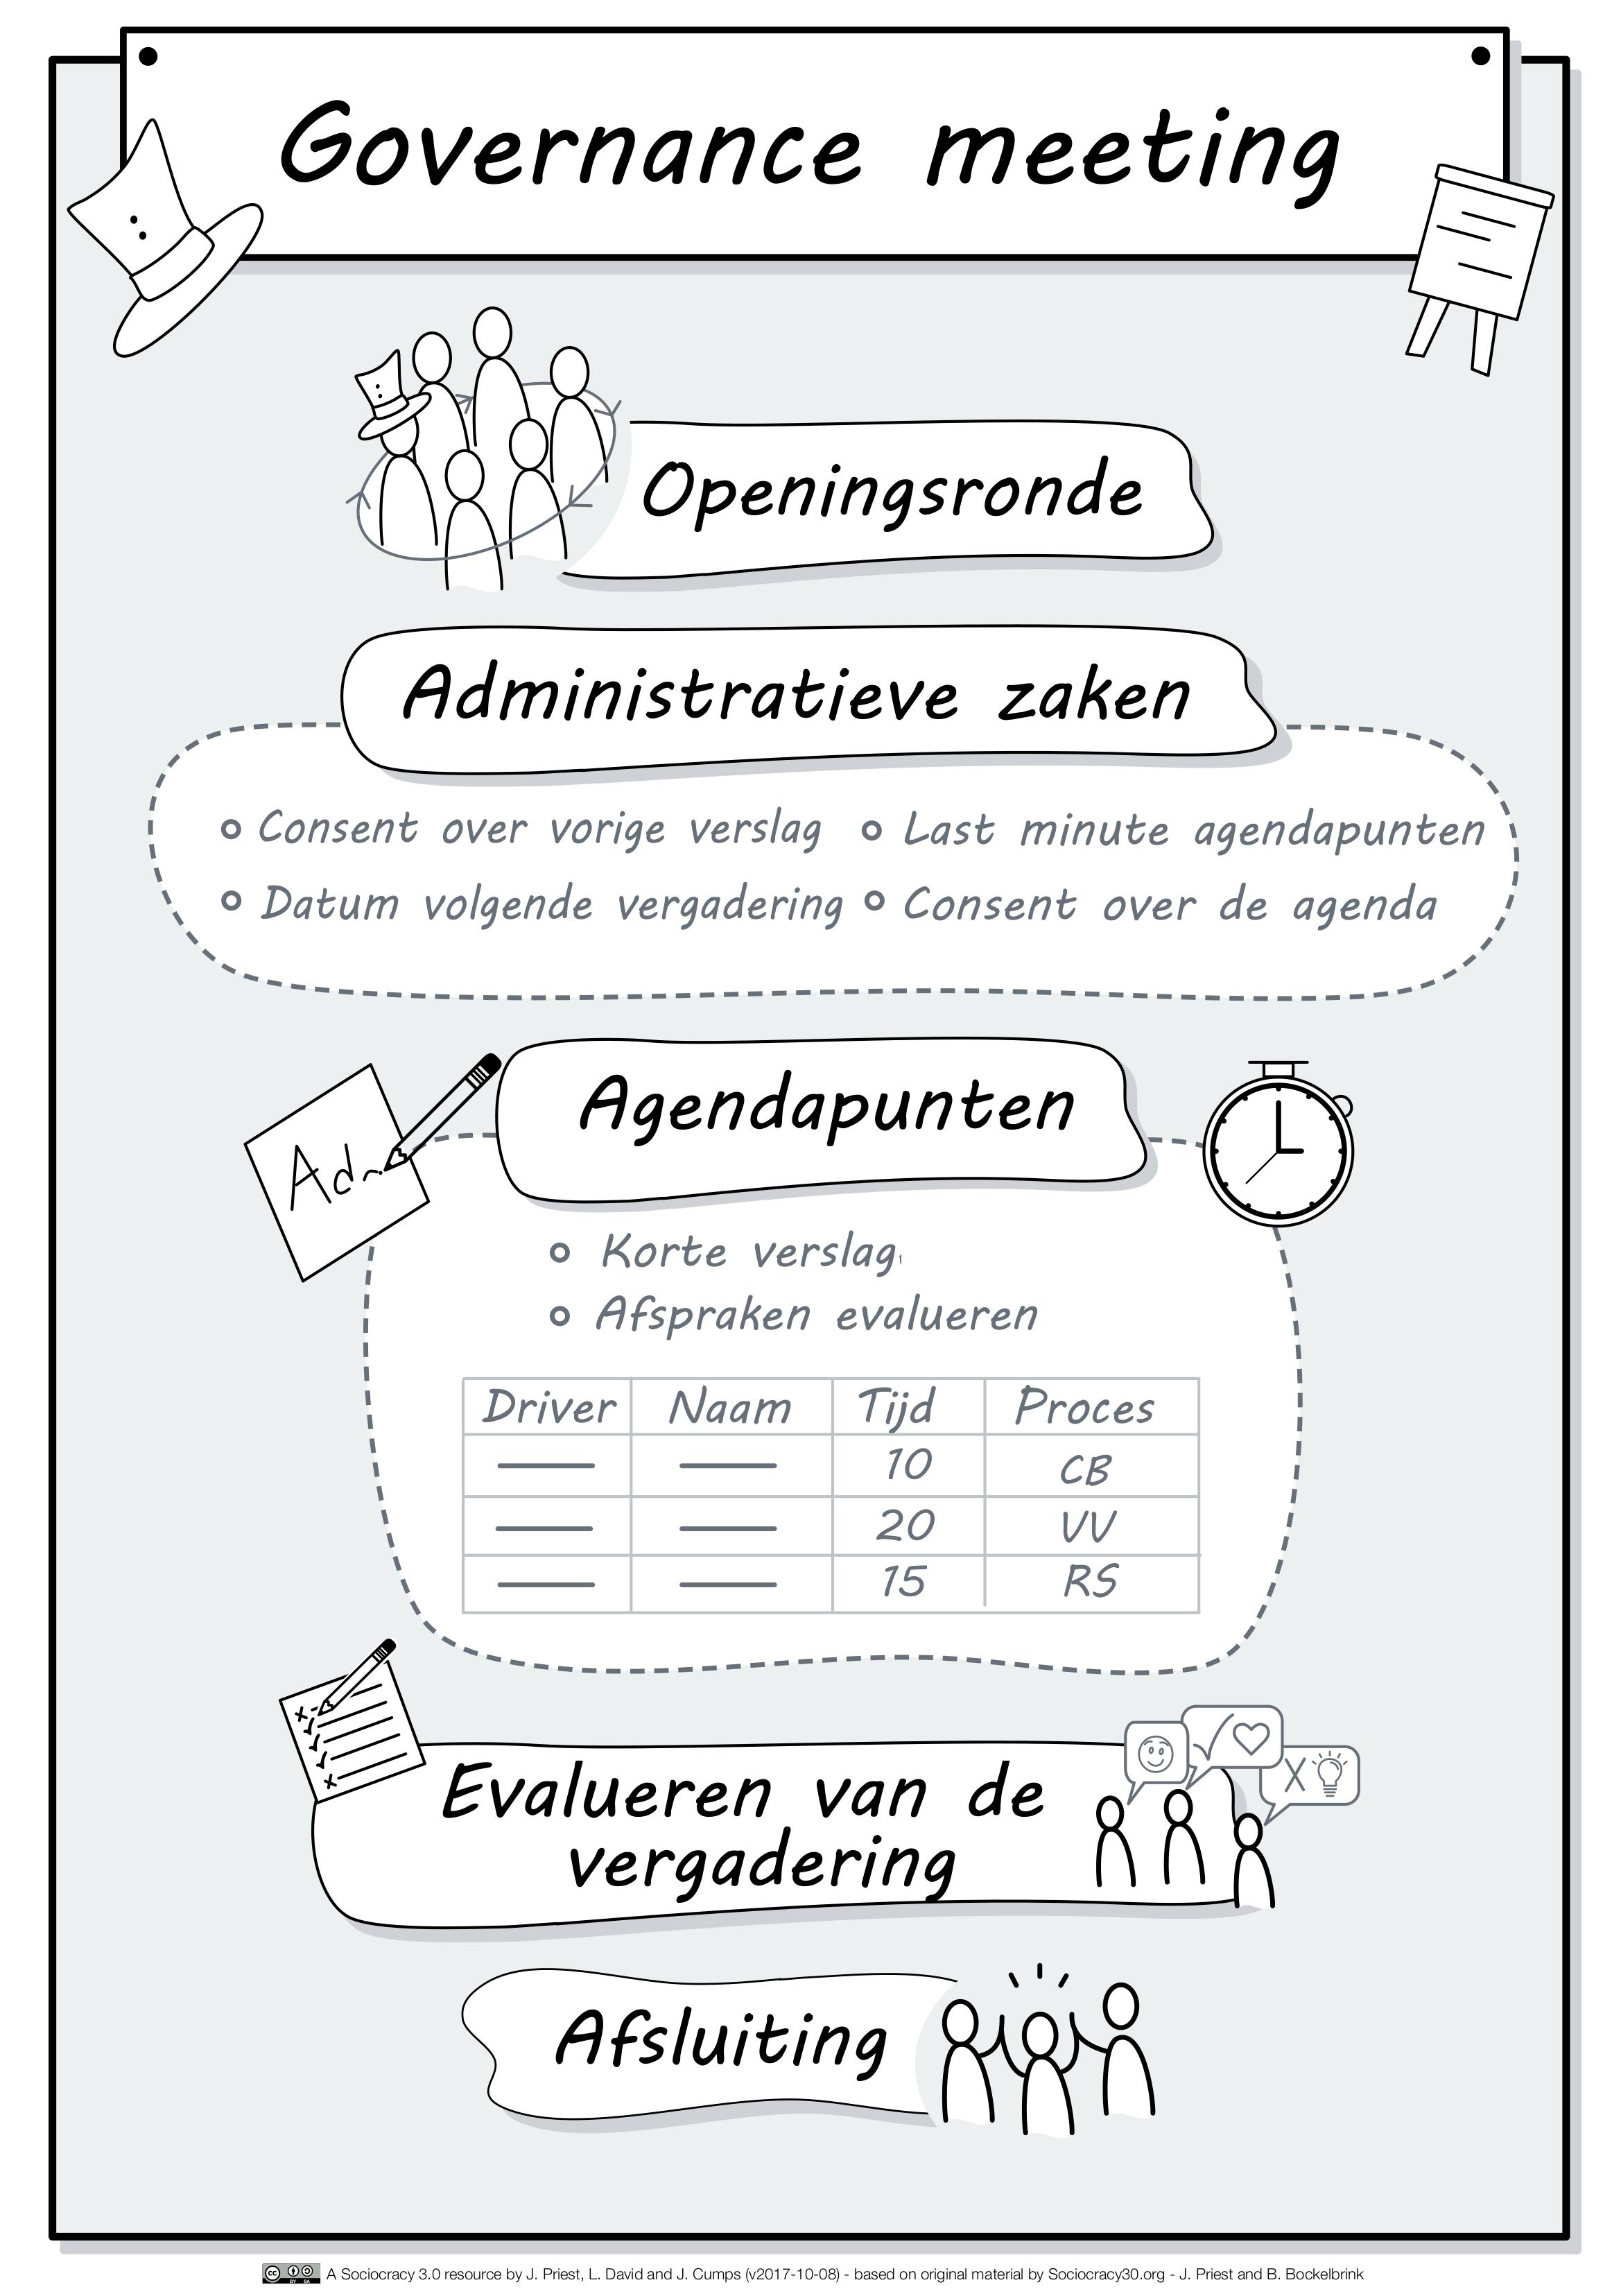 Governance Meeting_NL.png